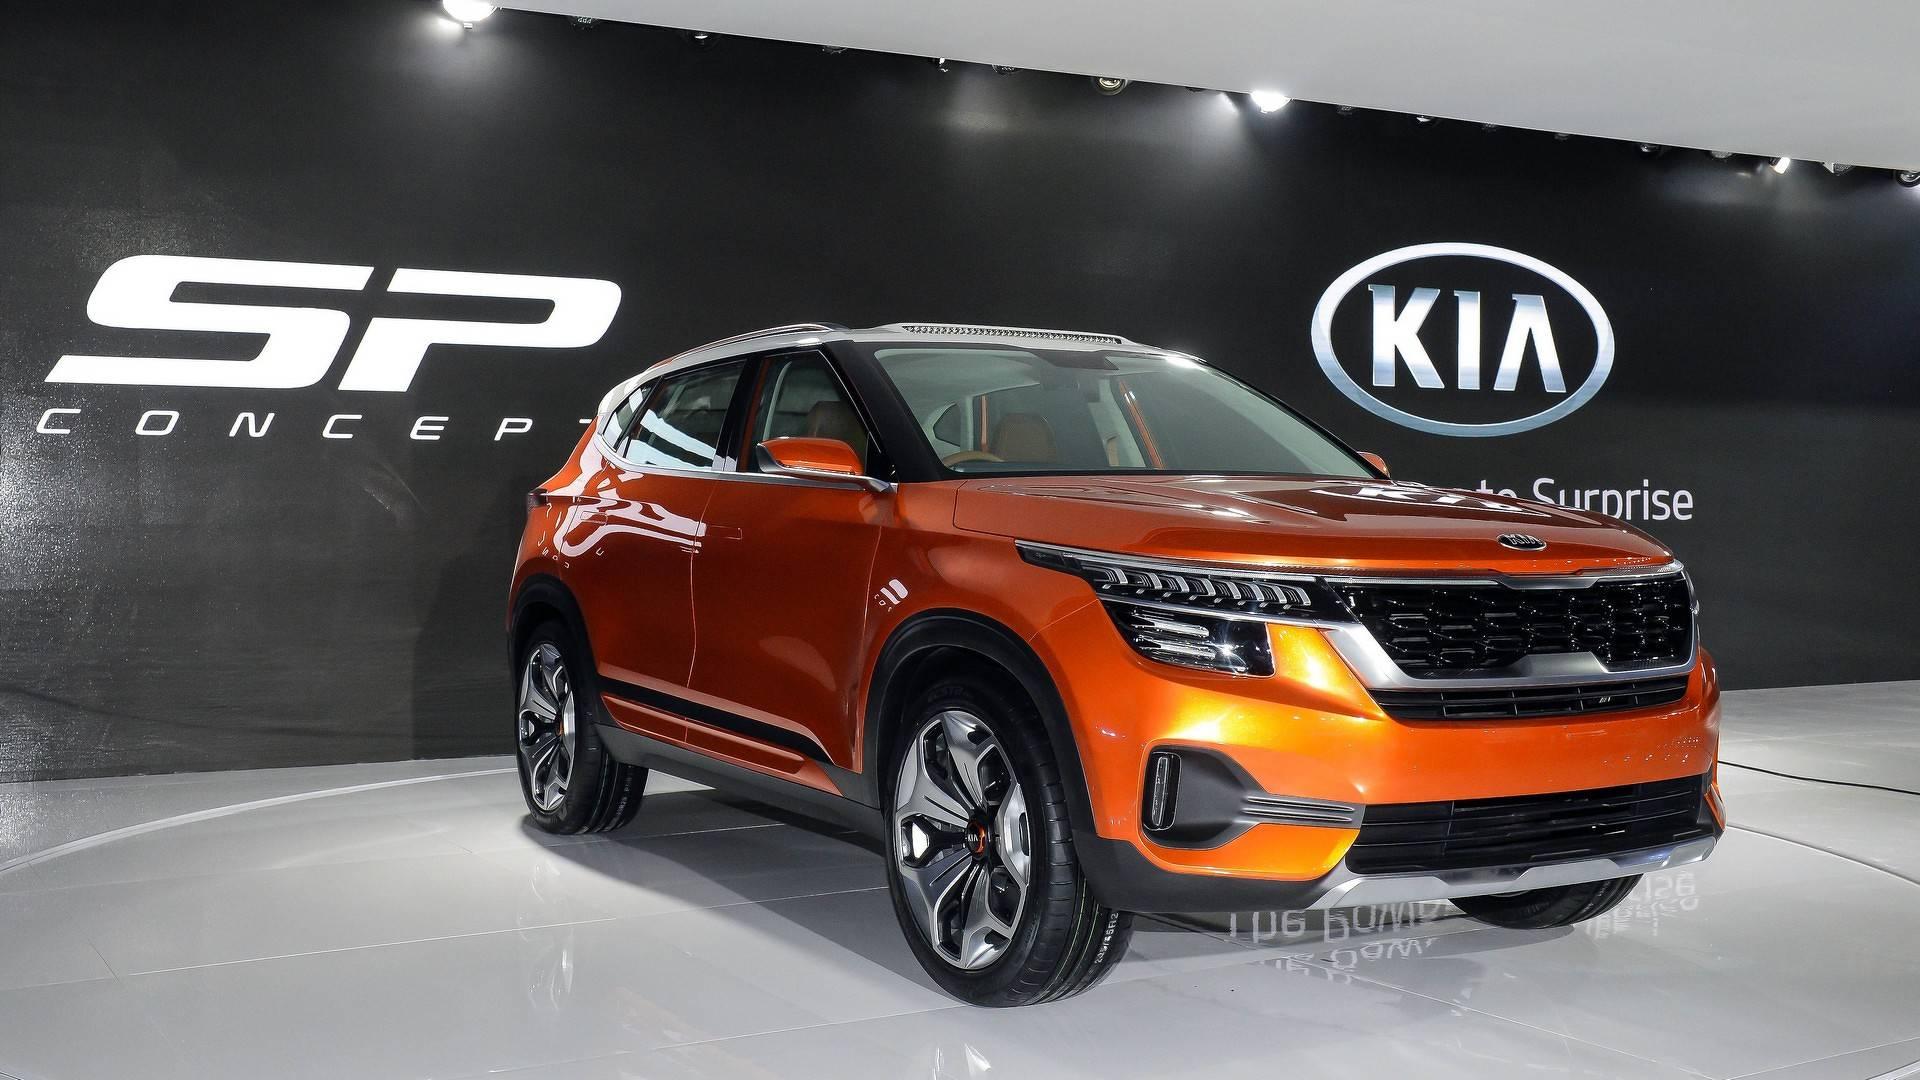 2018 kia sp concept کیا رسما در هند با مفهوم SP در نمایشگاه خودرو ۲۰۱۸ آغاز می شود   اجاره ماشین